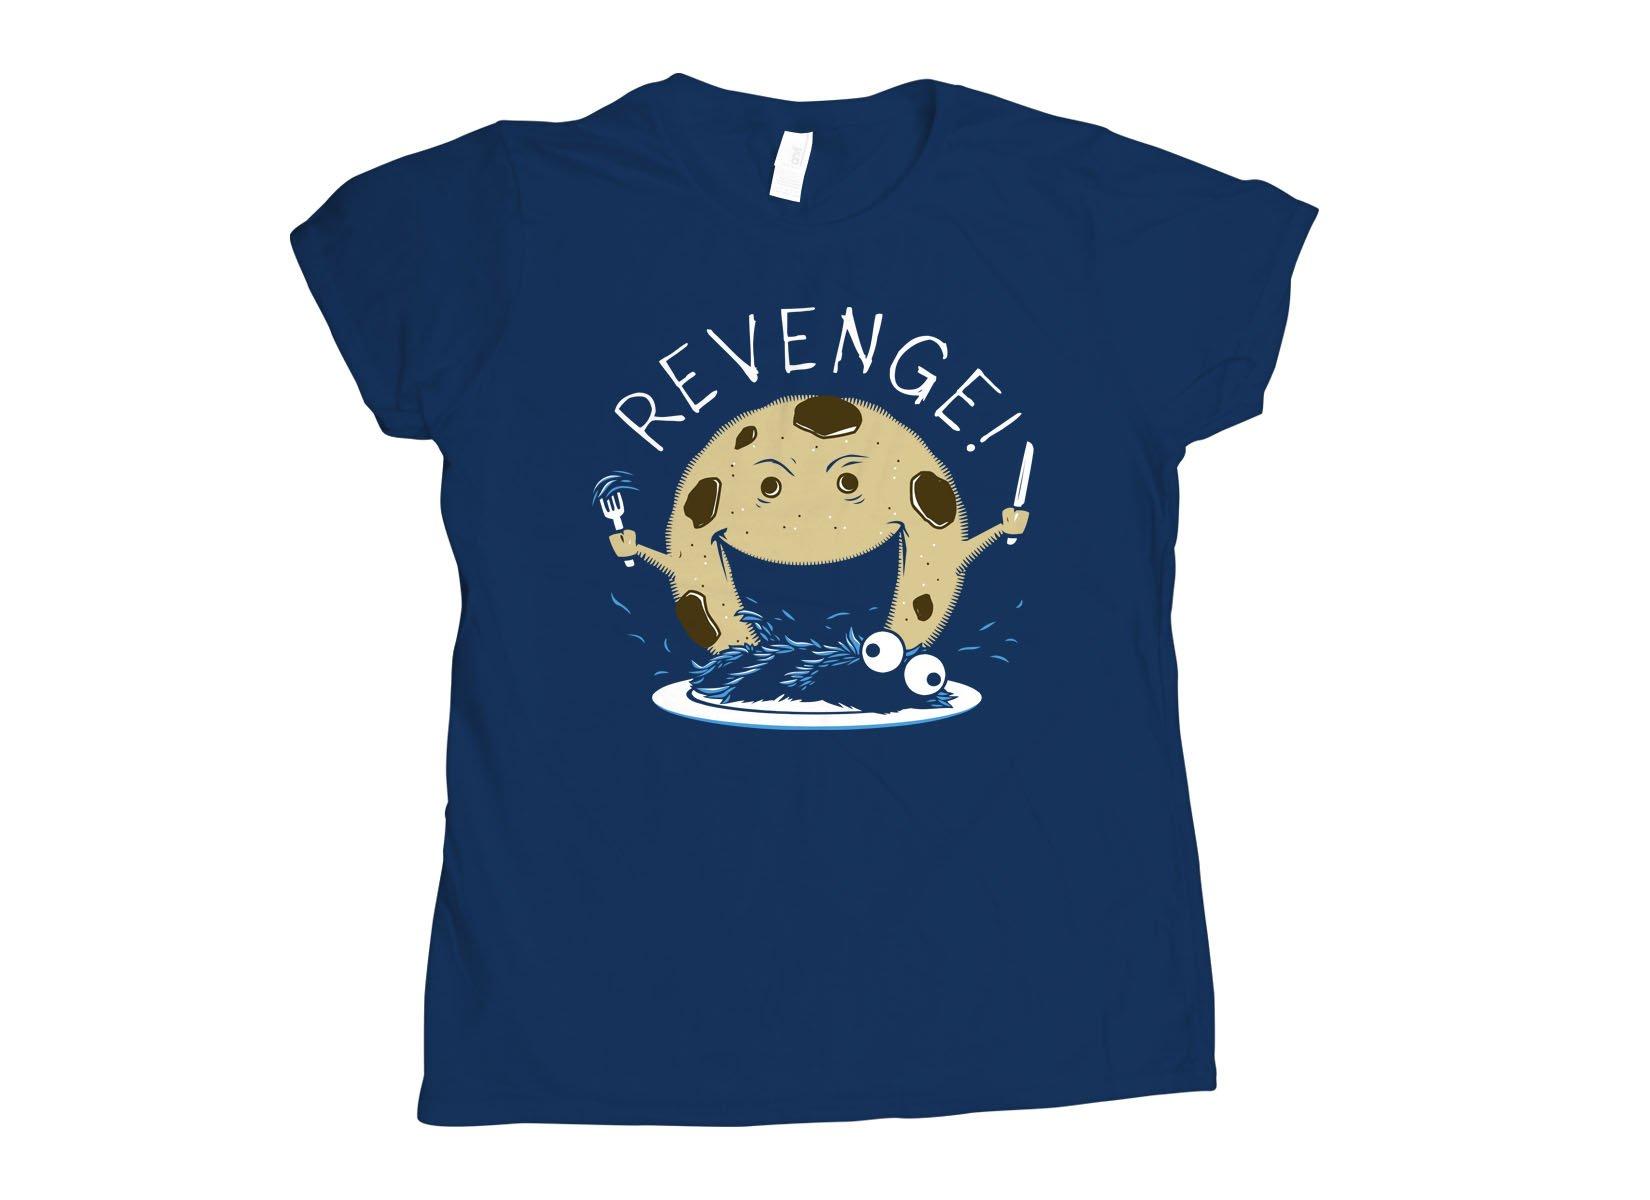 Cookie's Revenge on Womens T-Shirt